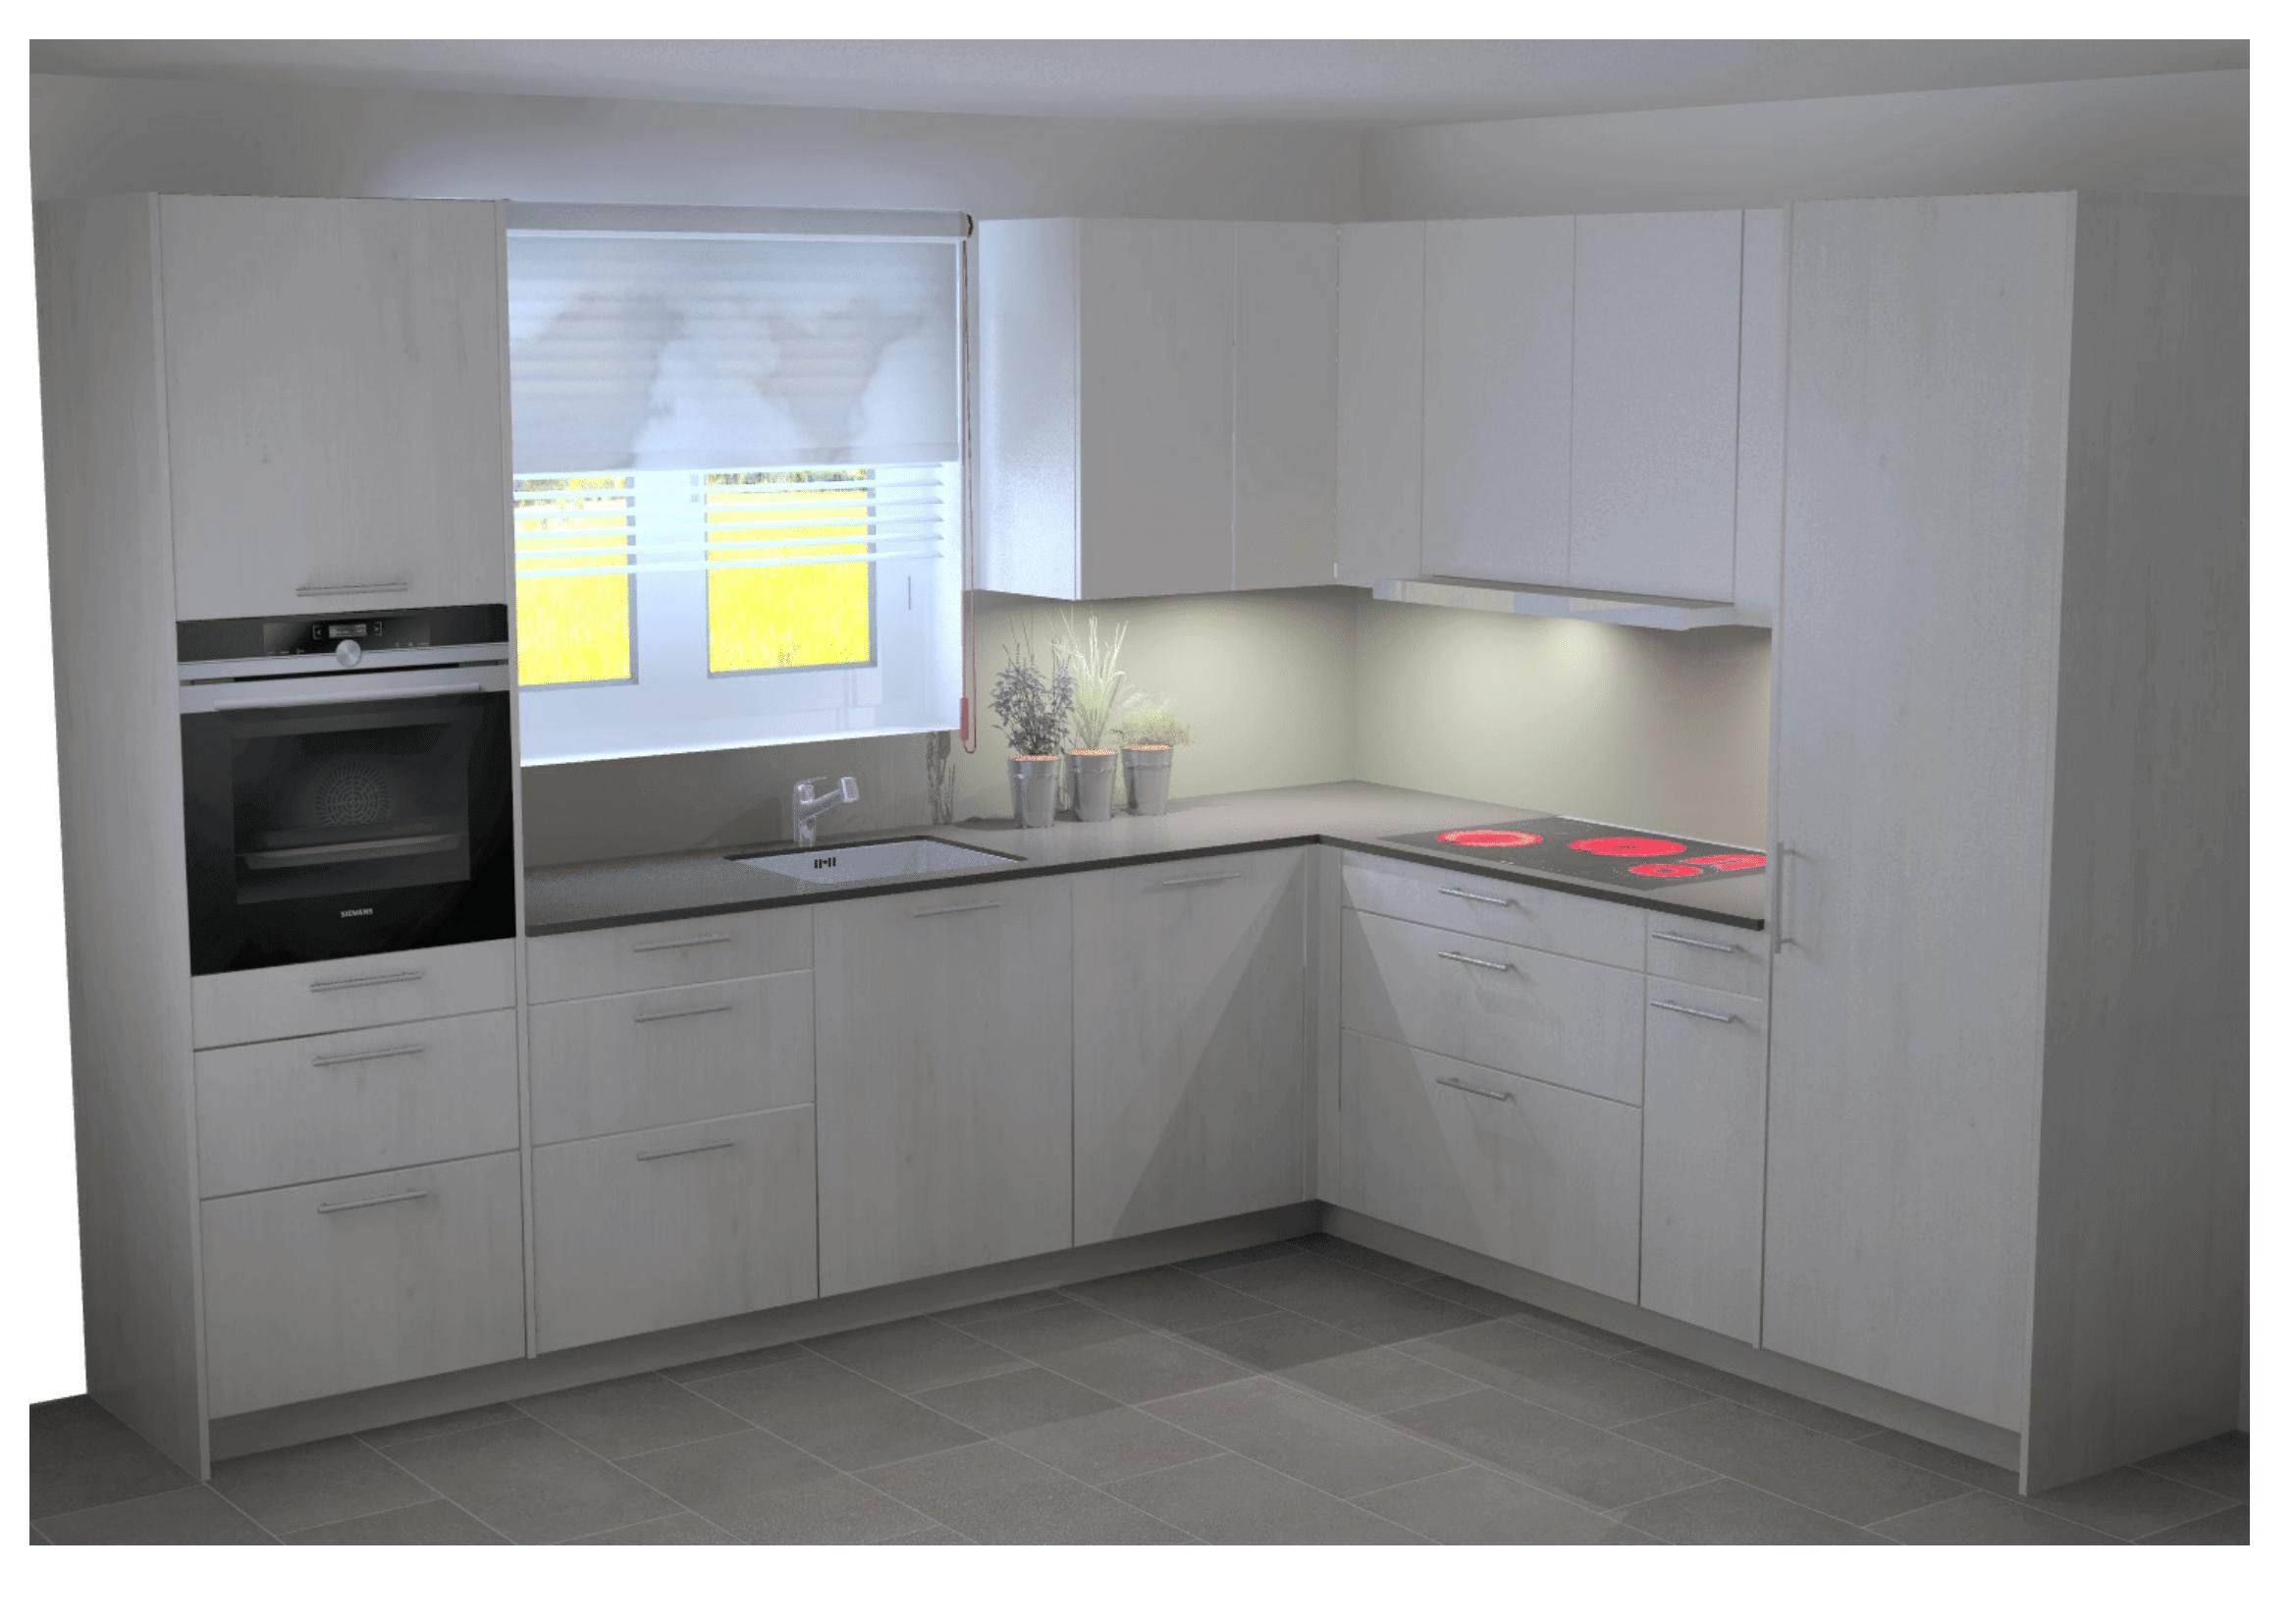 Full Size of Küche Ohne Elektrogeräte Kaufen Sinnvoll Küche Ohne Elektrogeräte Günstig Was Kostet Eine Küche Ohne Elektrogeräte Komplette Küche Ohne Elektrogeräte Küche Küche Ohne Elektrogeräte